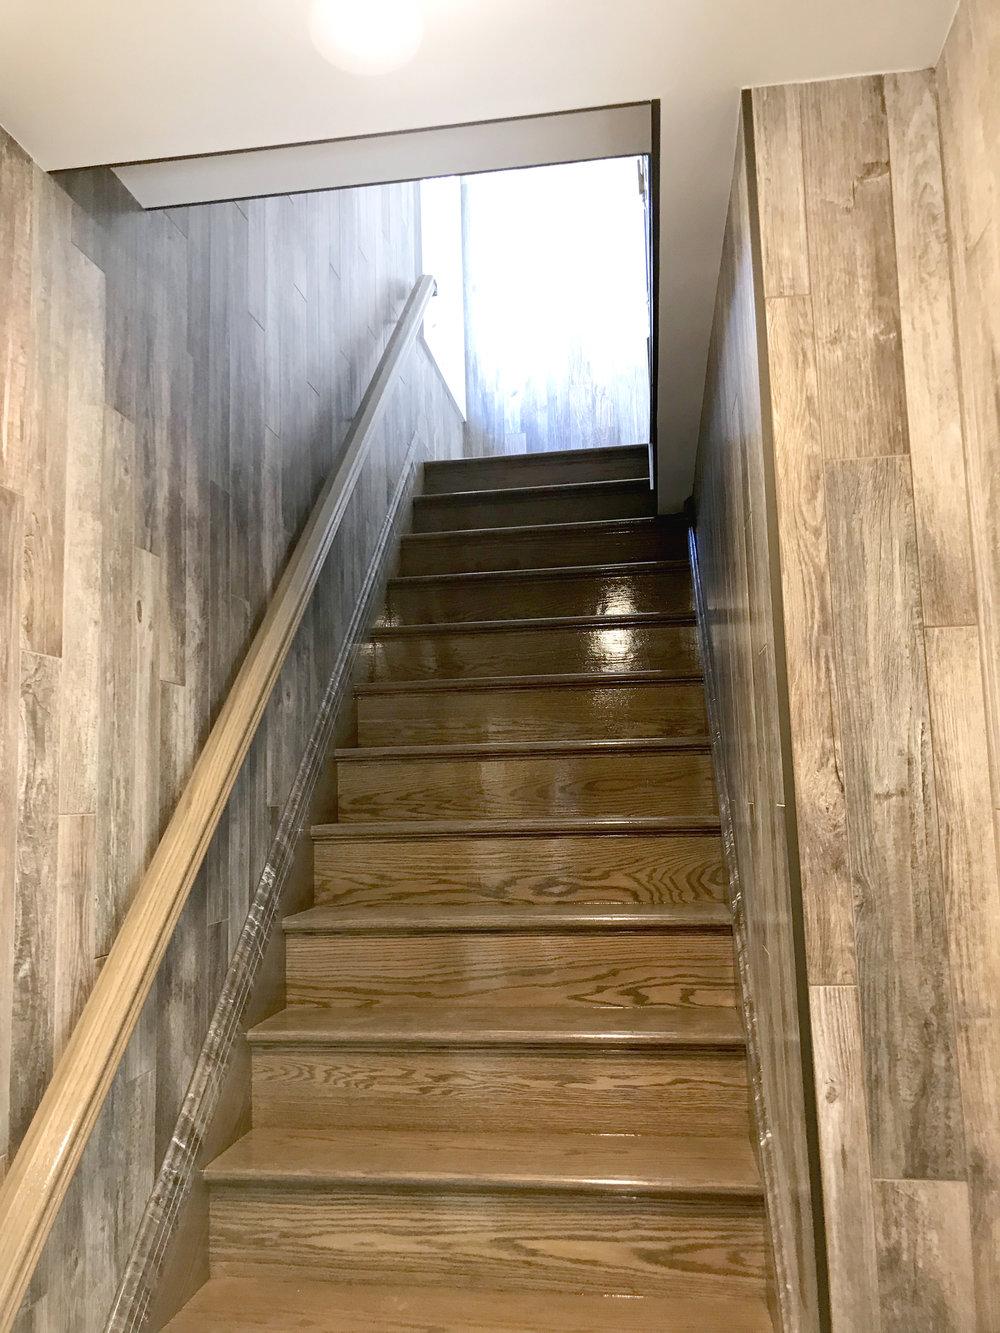 woodgrain-stairs-1.jpg